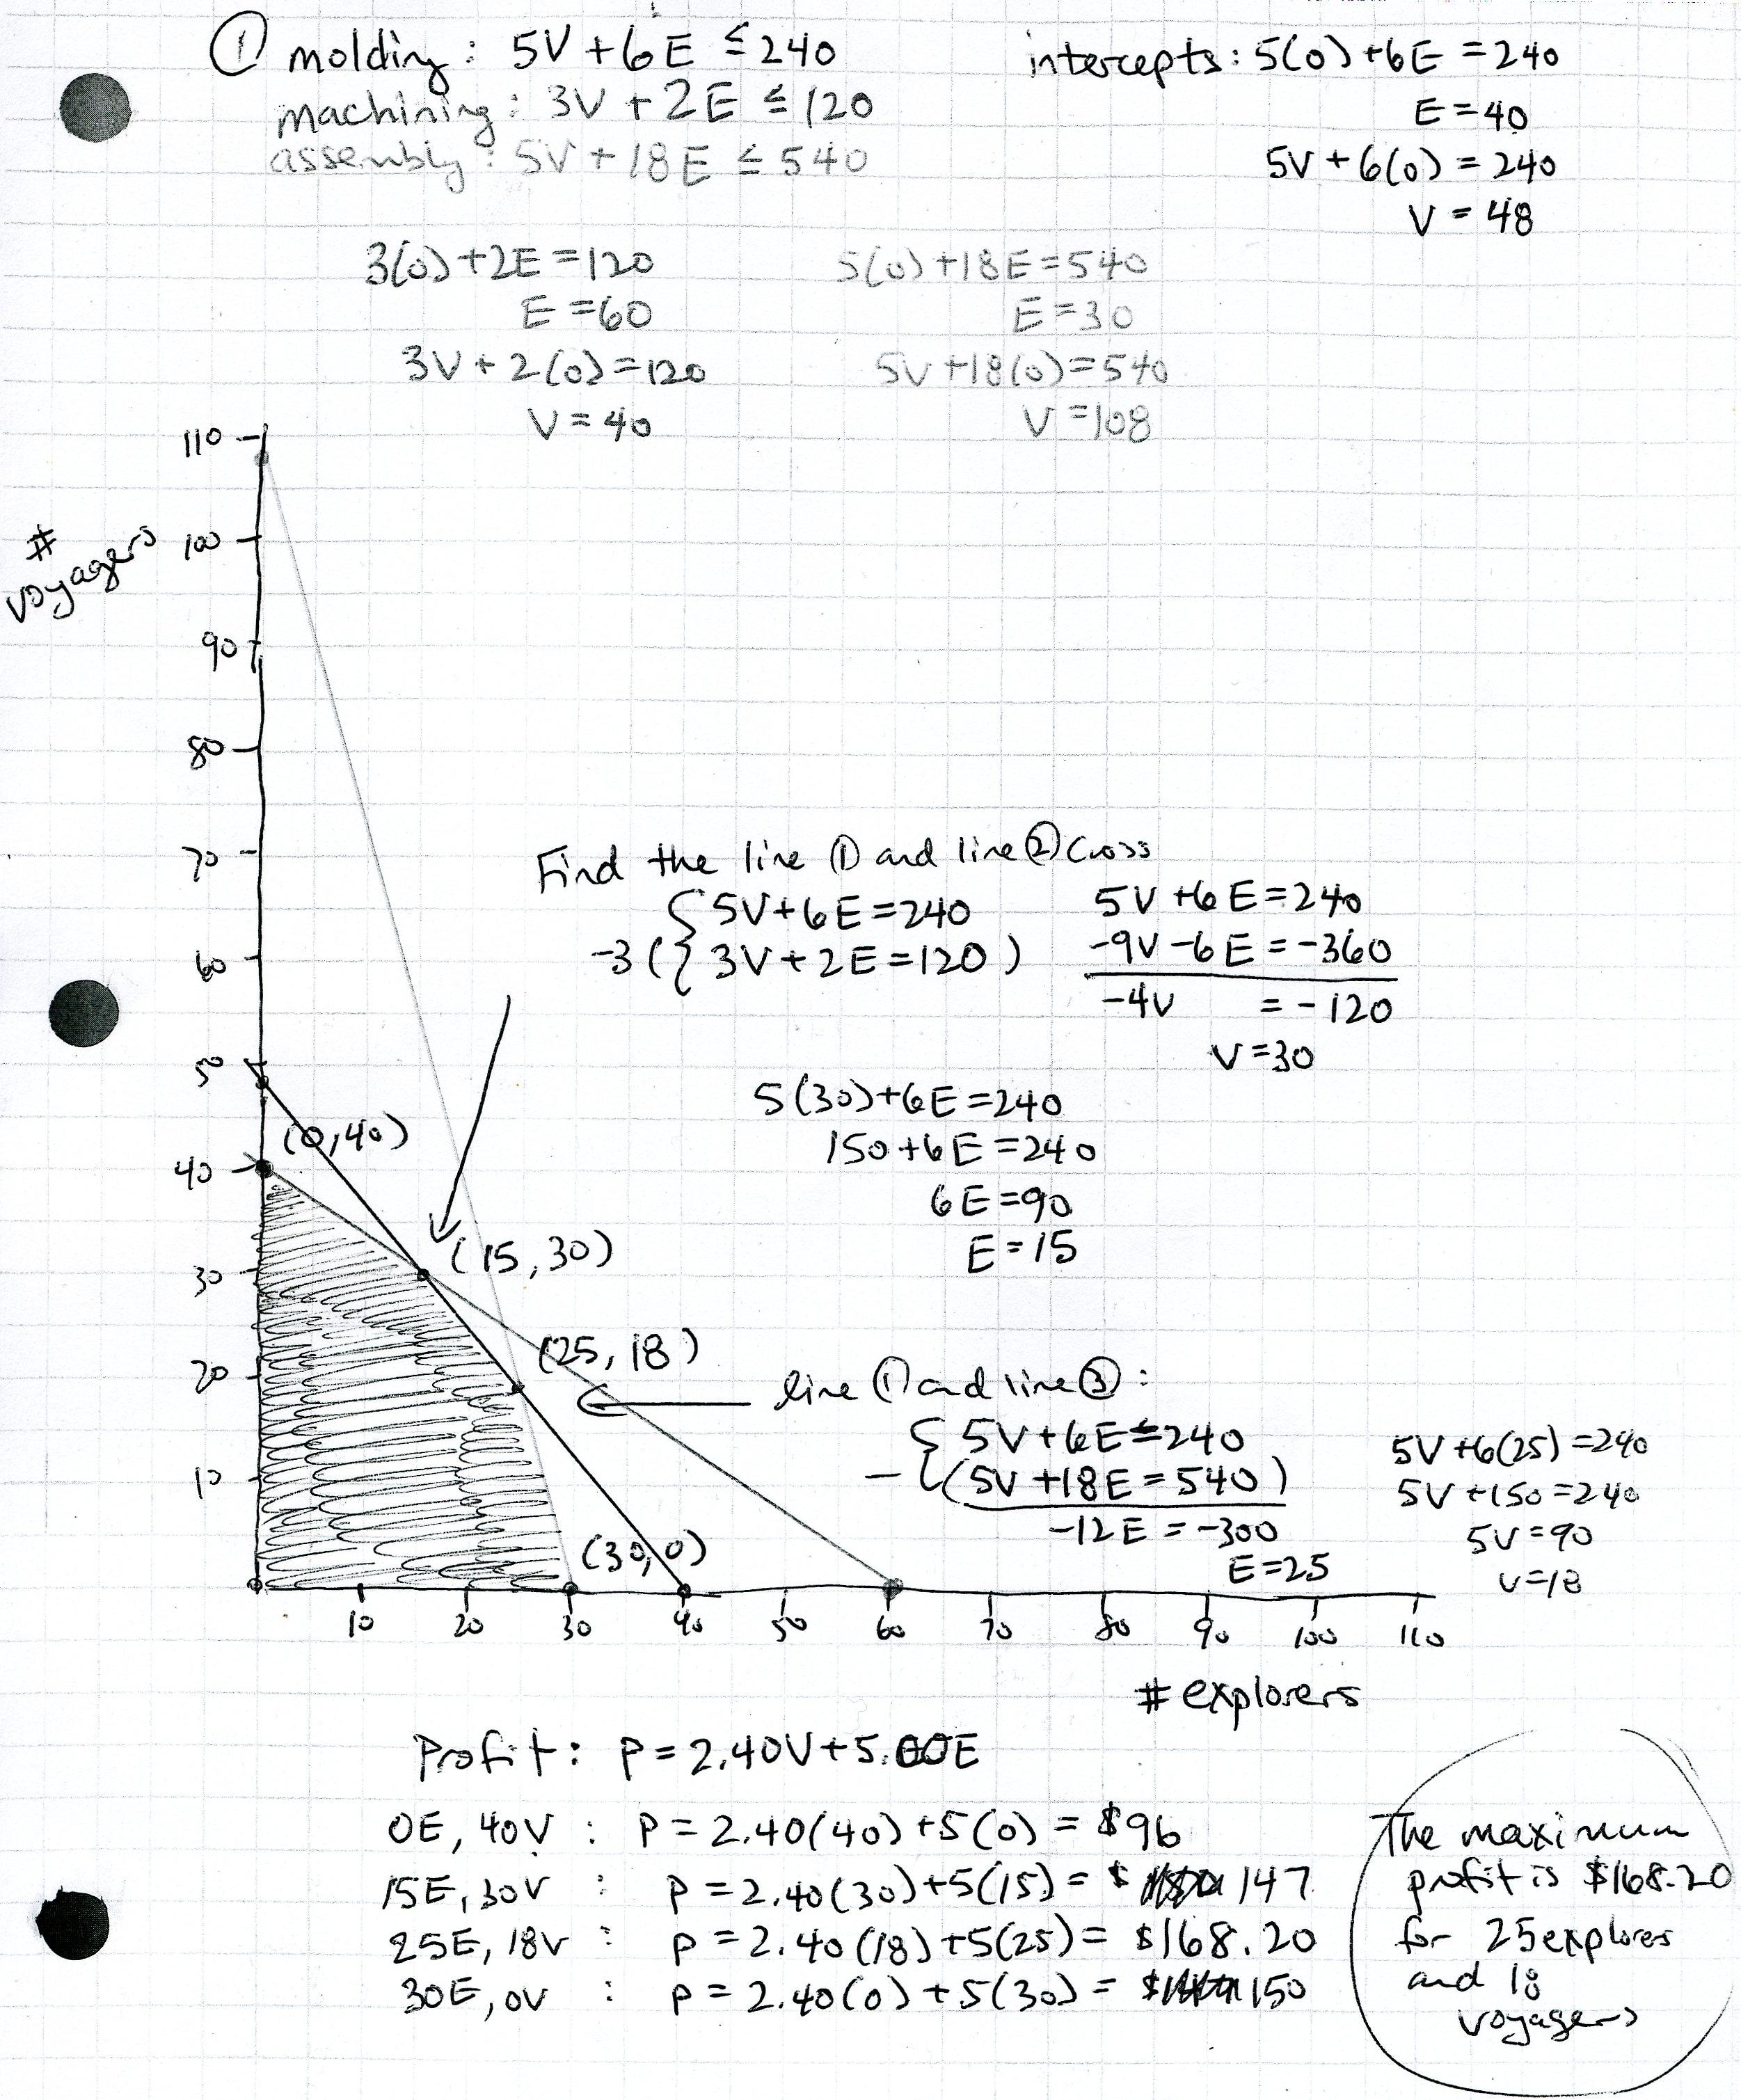 worksheet Factoring Trinomials Practice Worksheet factoring trinomials by grouping worksheet abitlikethis polynomial practice worksheets as well best worksheet